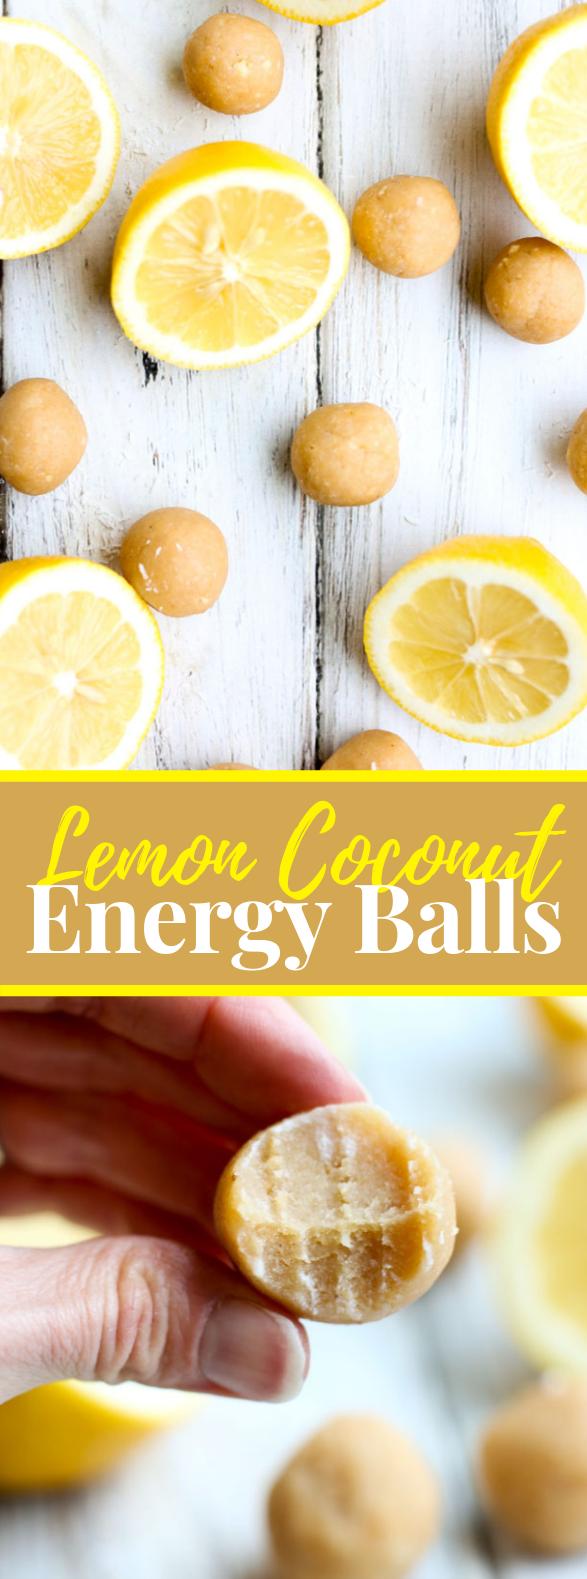 lemon coconut energy balls #healthy #protein